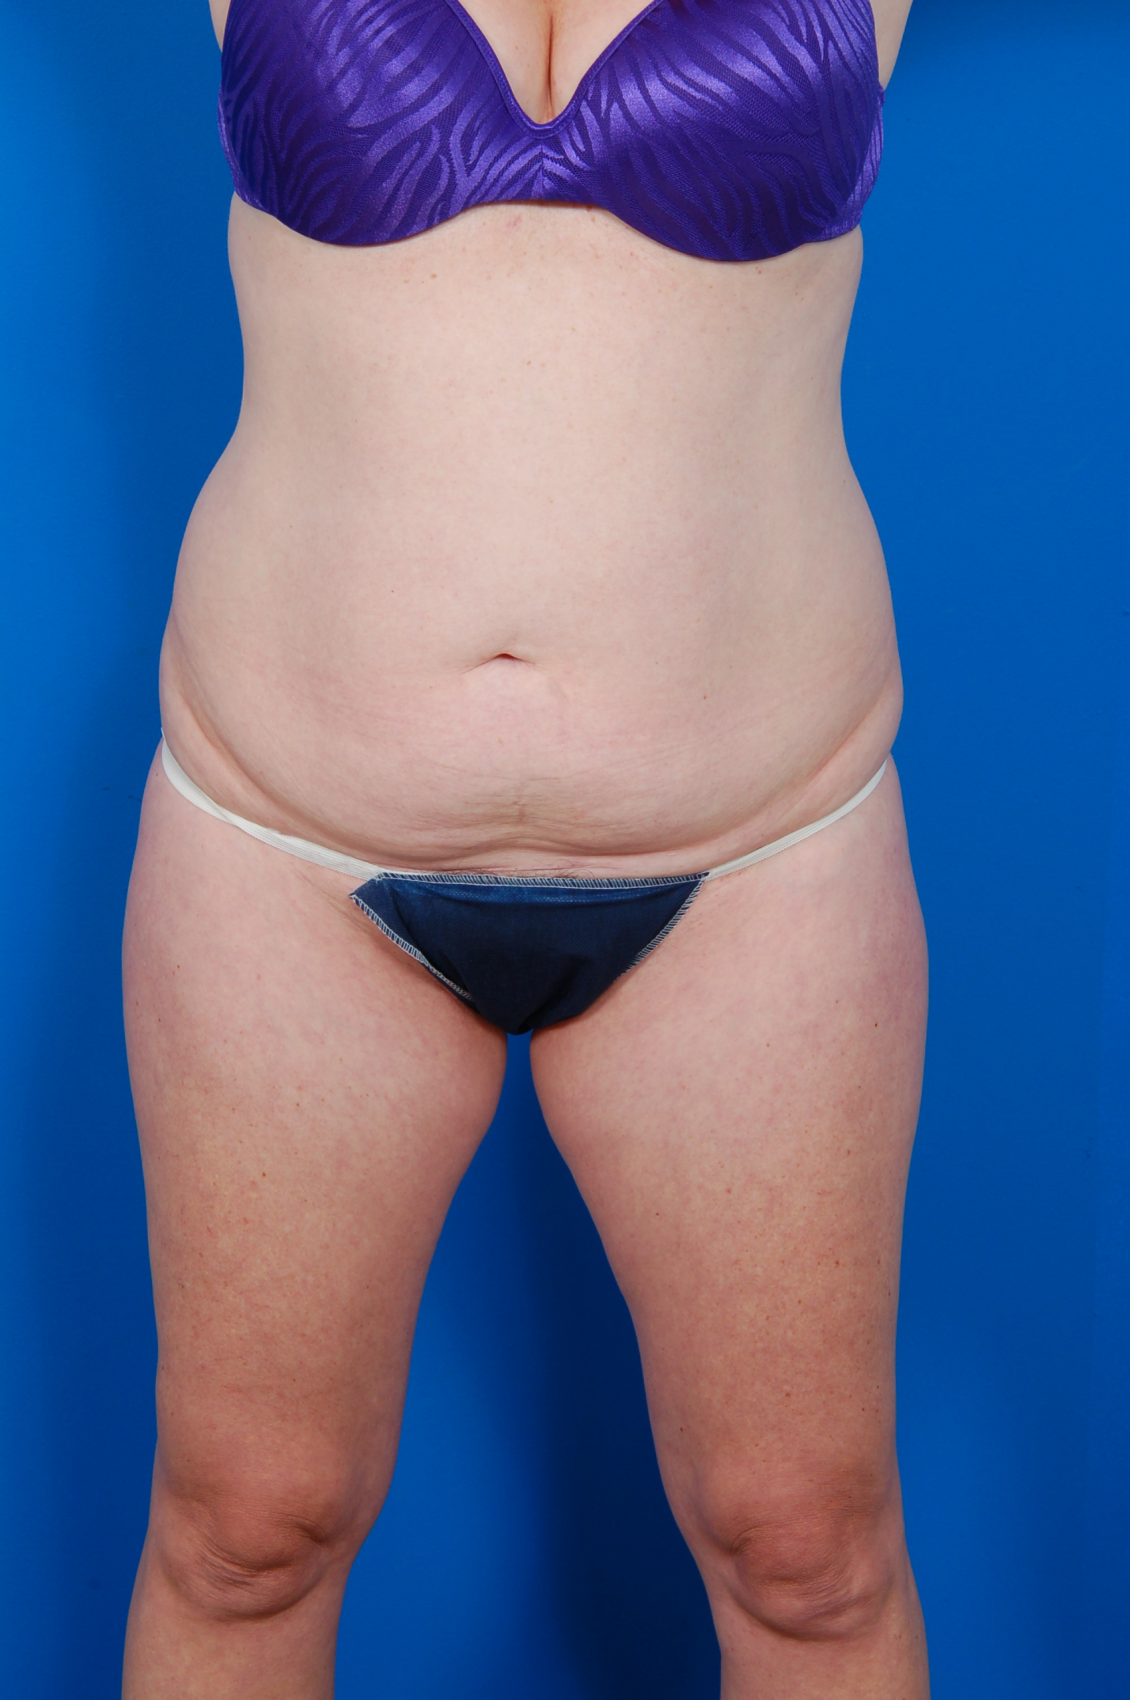 Tummy Tuck Photos: Case 11 - before